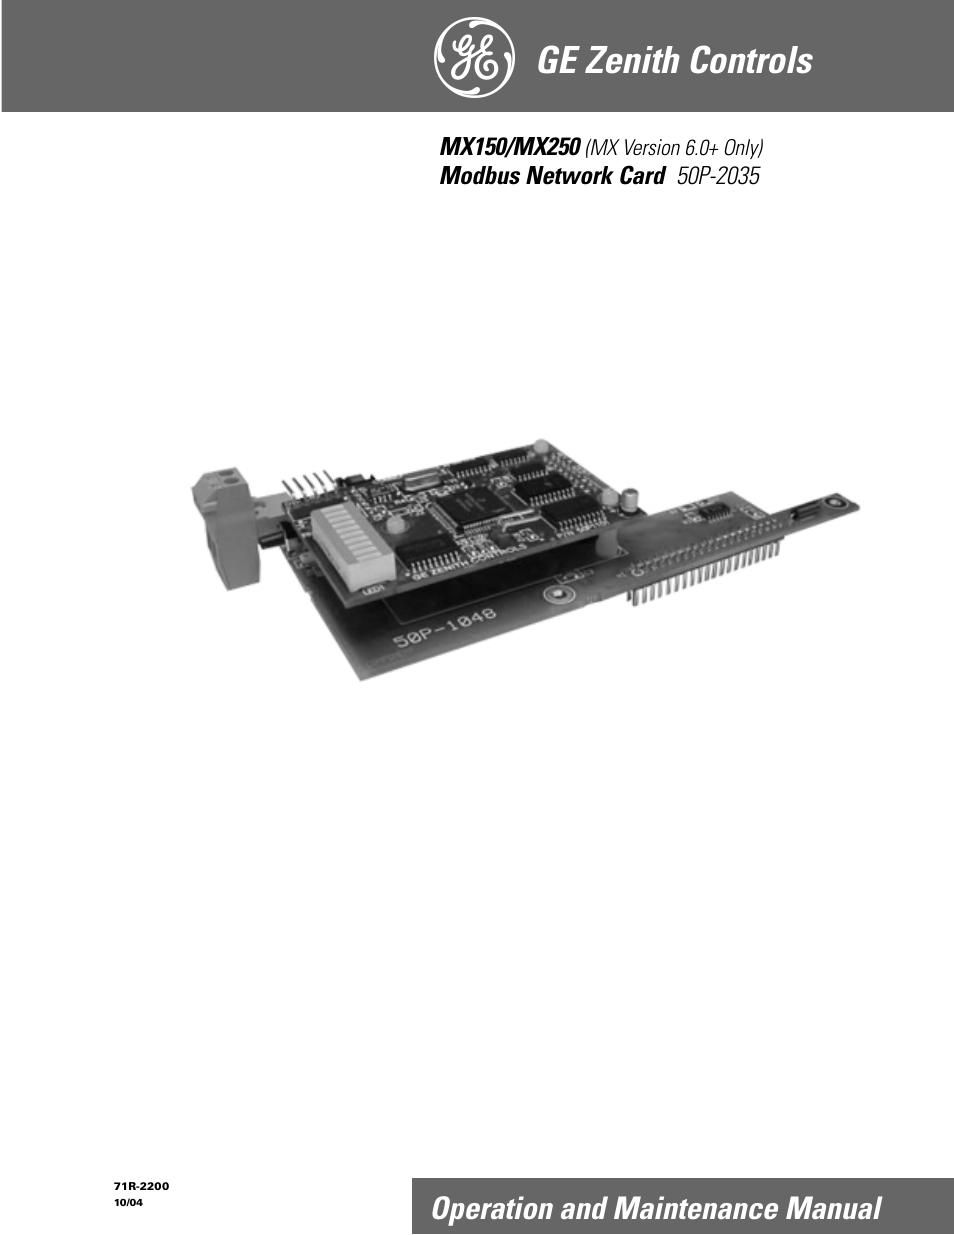 ge industrial solutions mx150 mx250 modbus network card user manual rh manualsdir com GE Capital Credit Card Jewelry Walmart GE Credit Cards